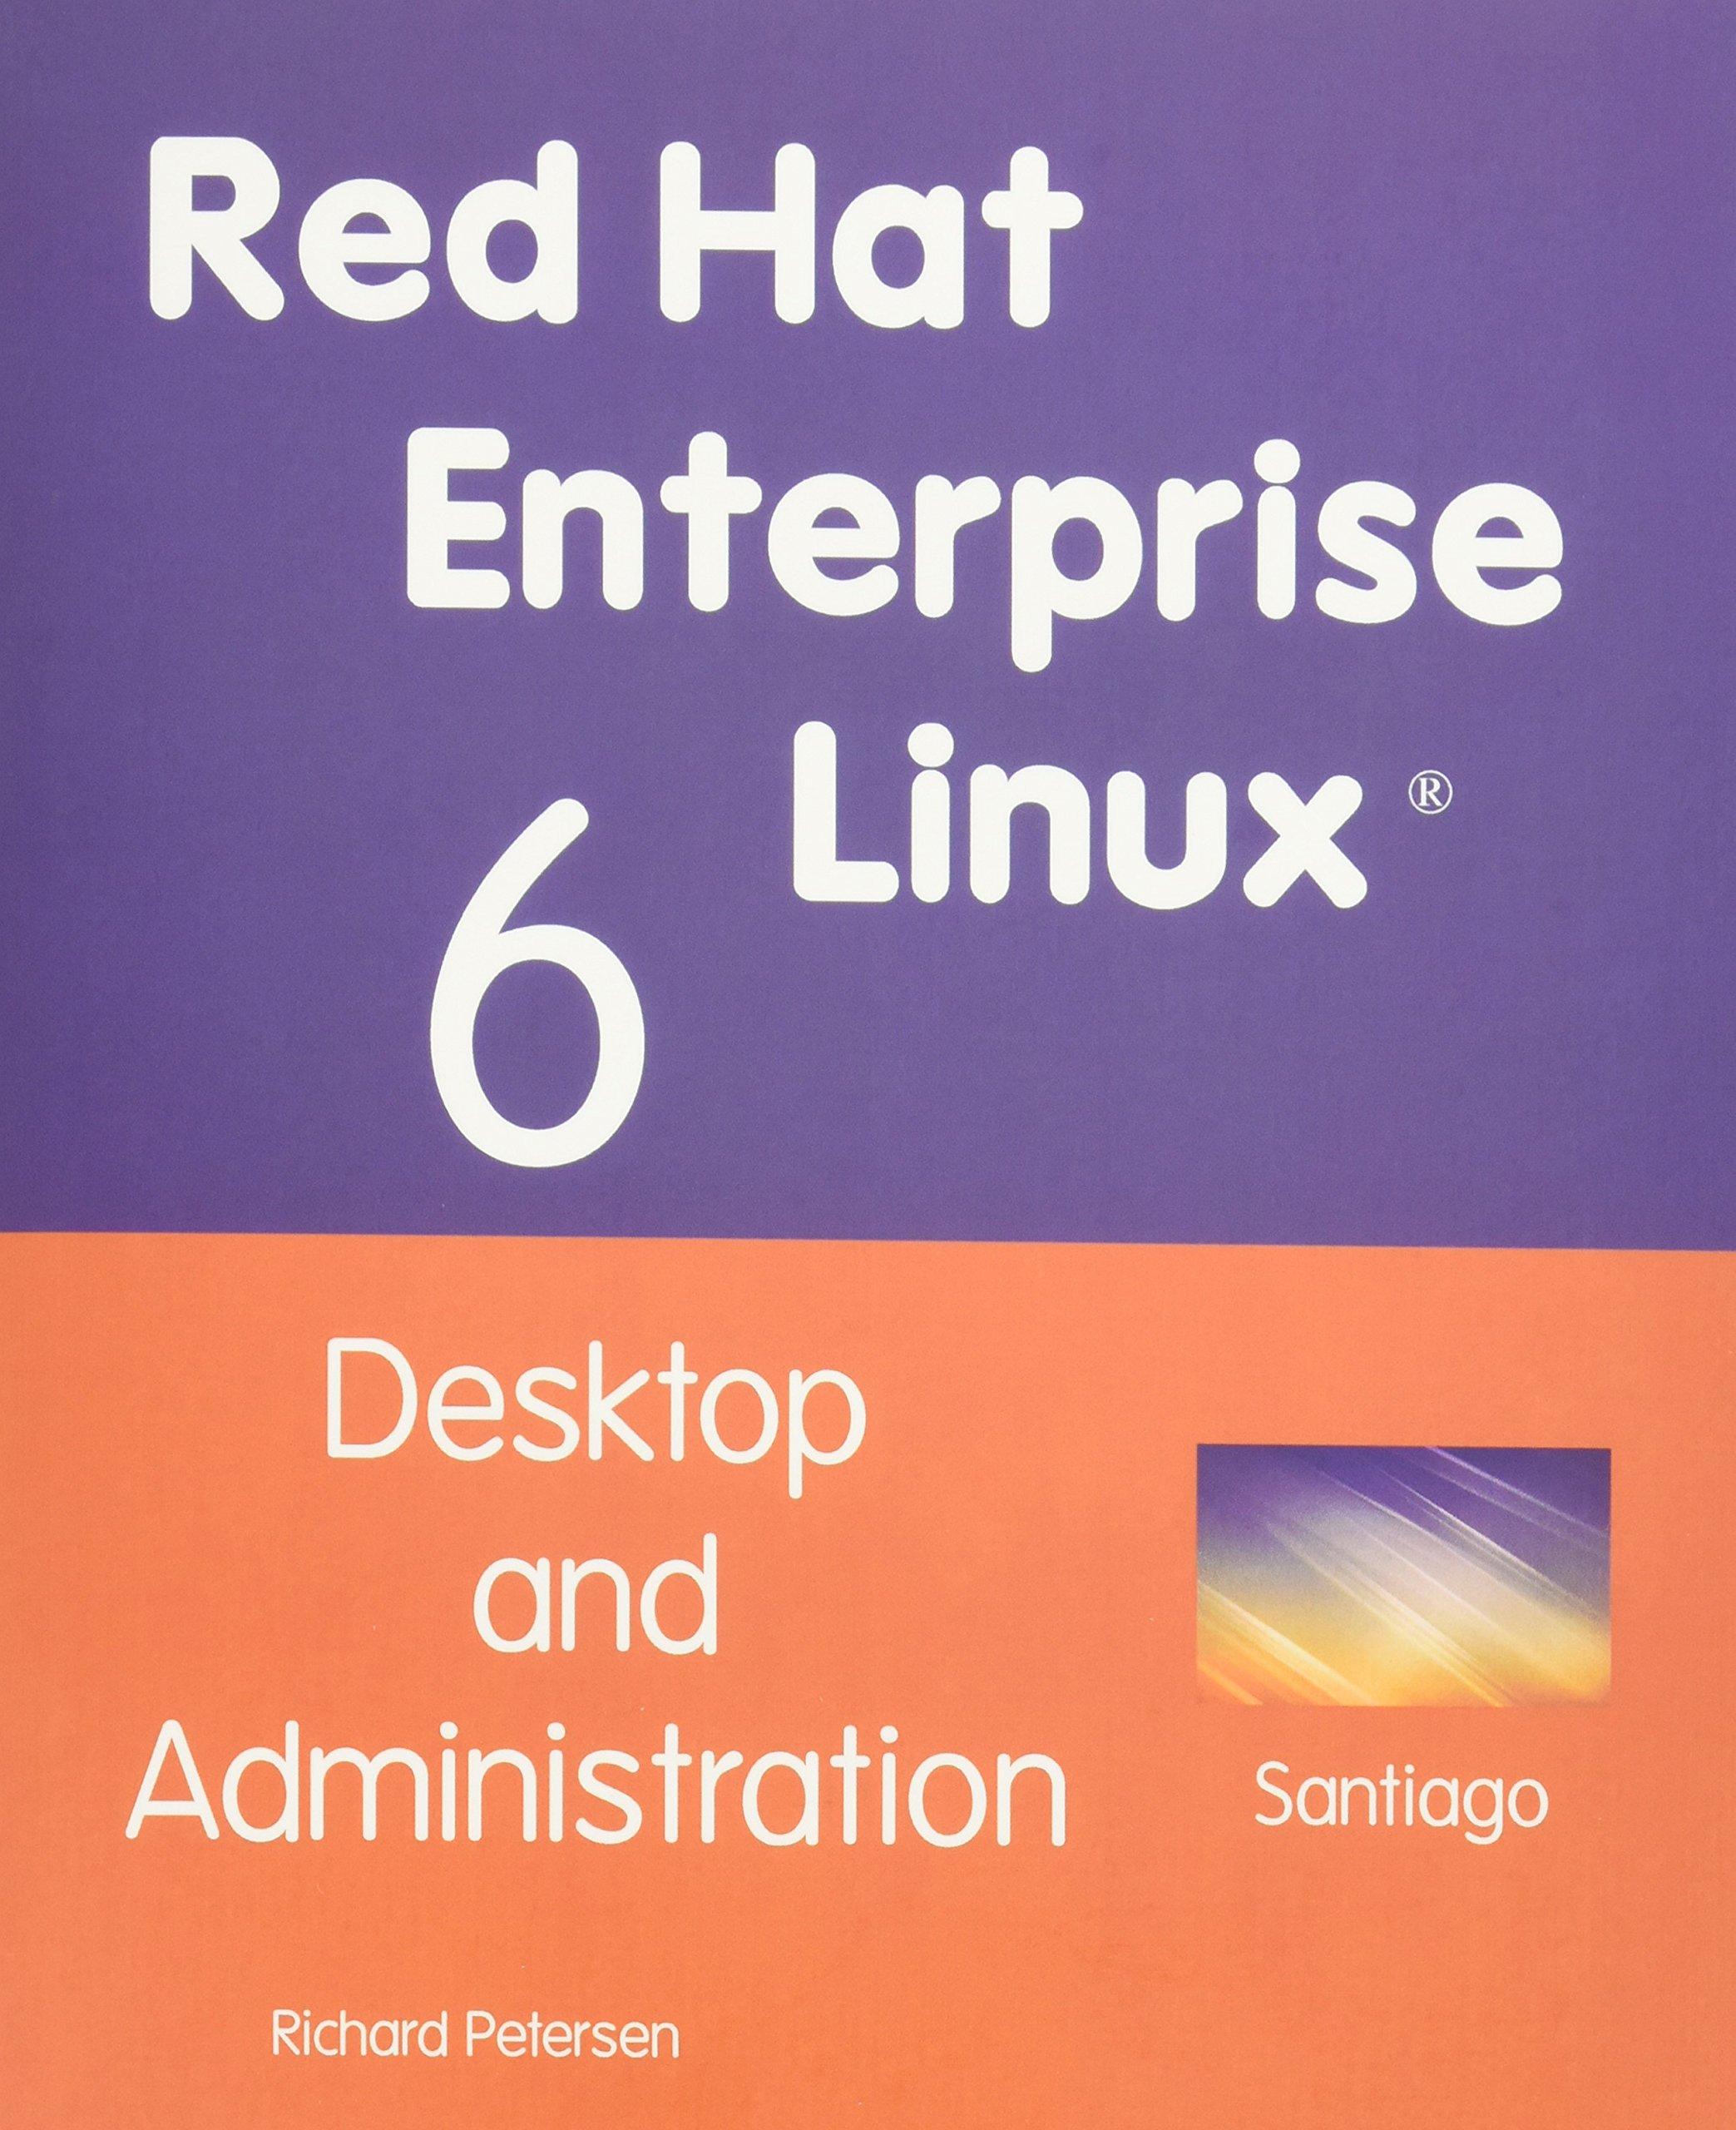 Red hat enterprise linux 6 desktop and administration richard petersen 9781936280254 amazon com books